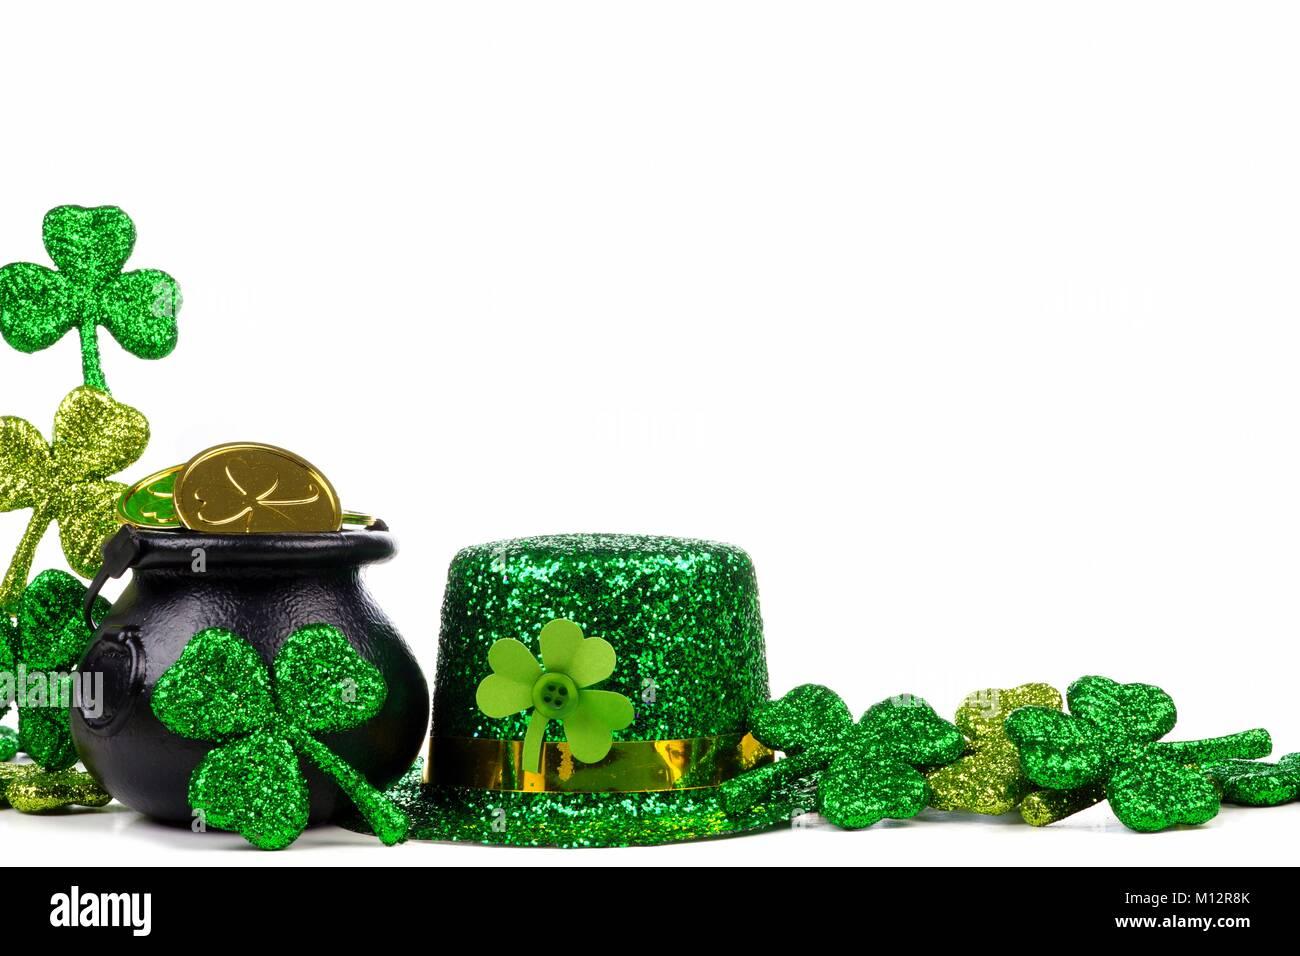 PATRICKS DAY GREEN GOLD SHAMROCK LUCKY IRISH IRELAND LEPRECHAUN HATS SAINT ST